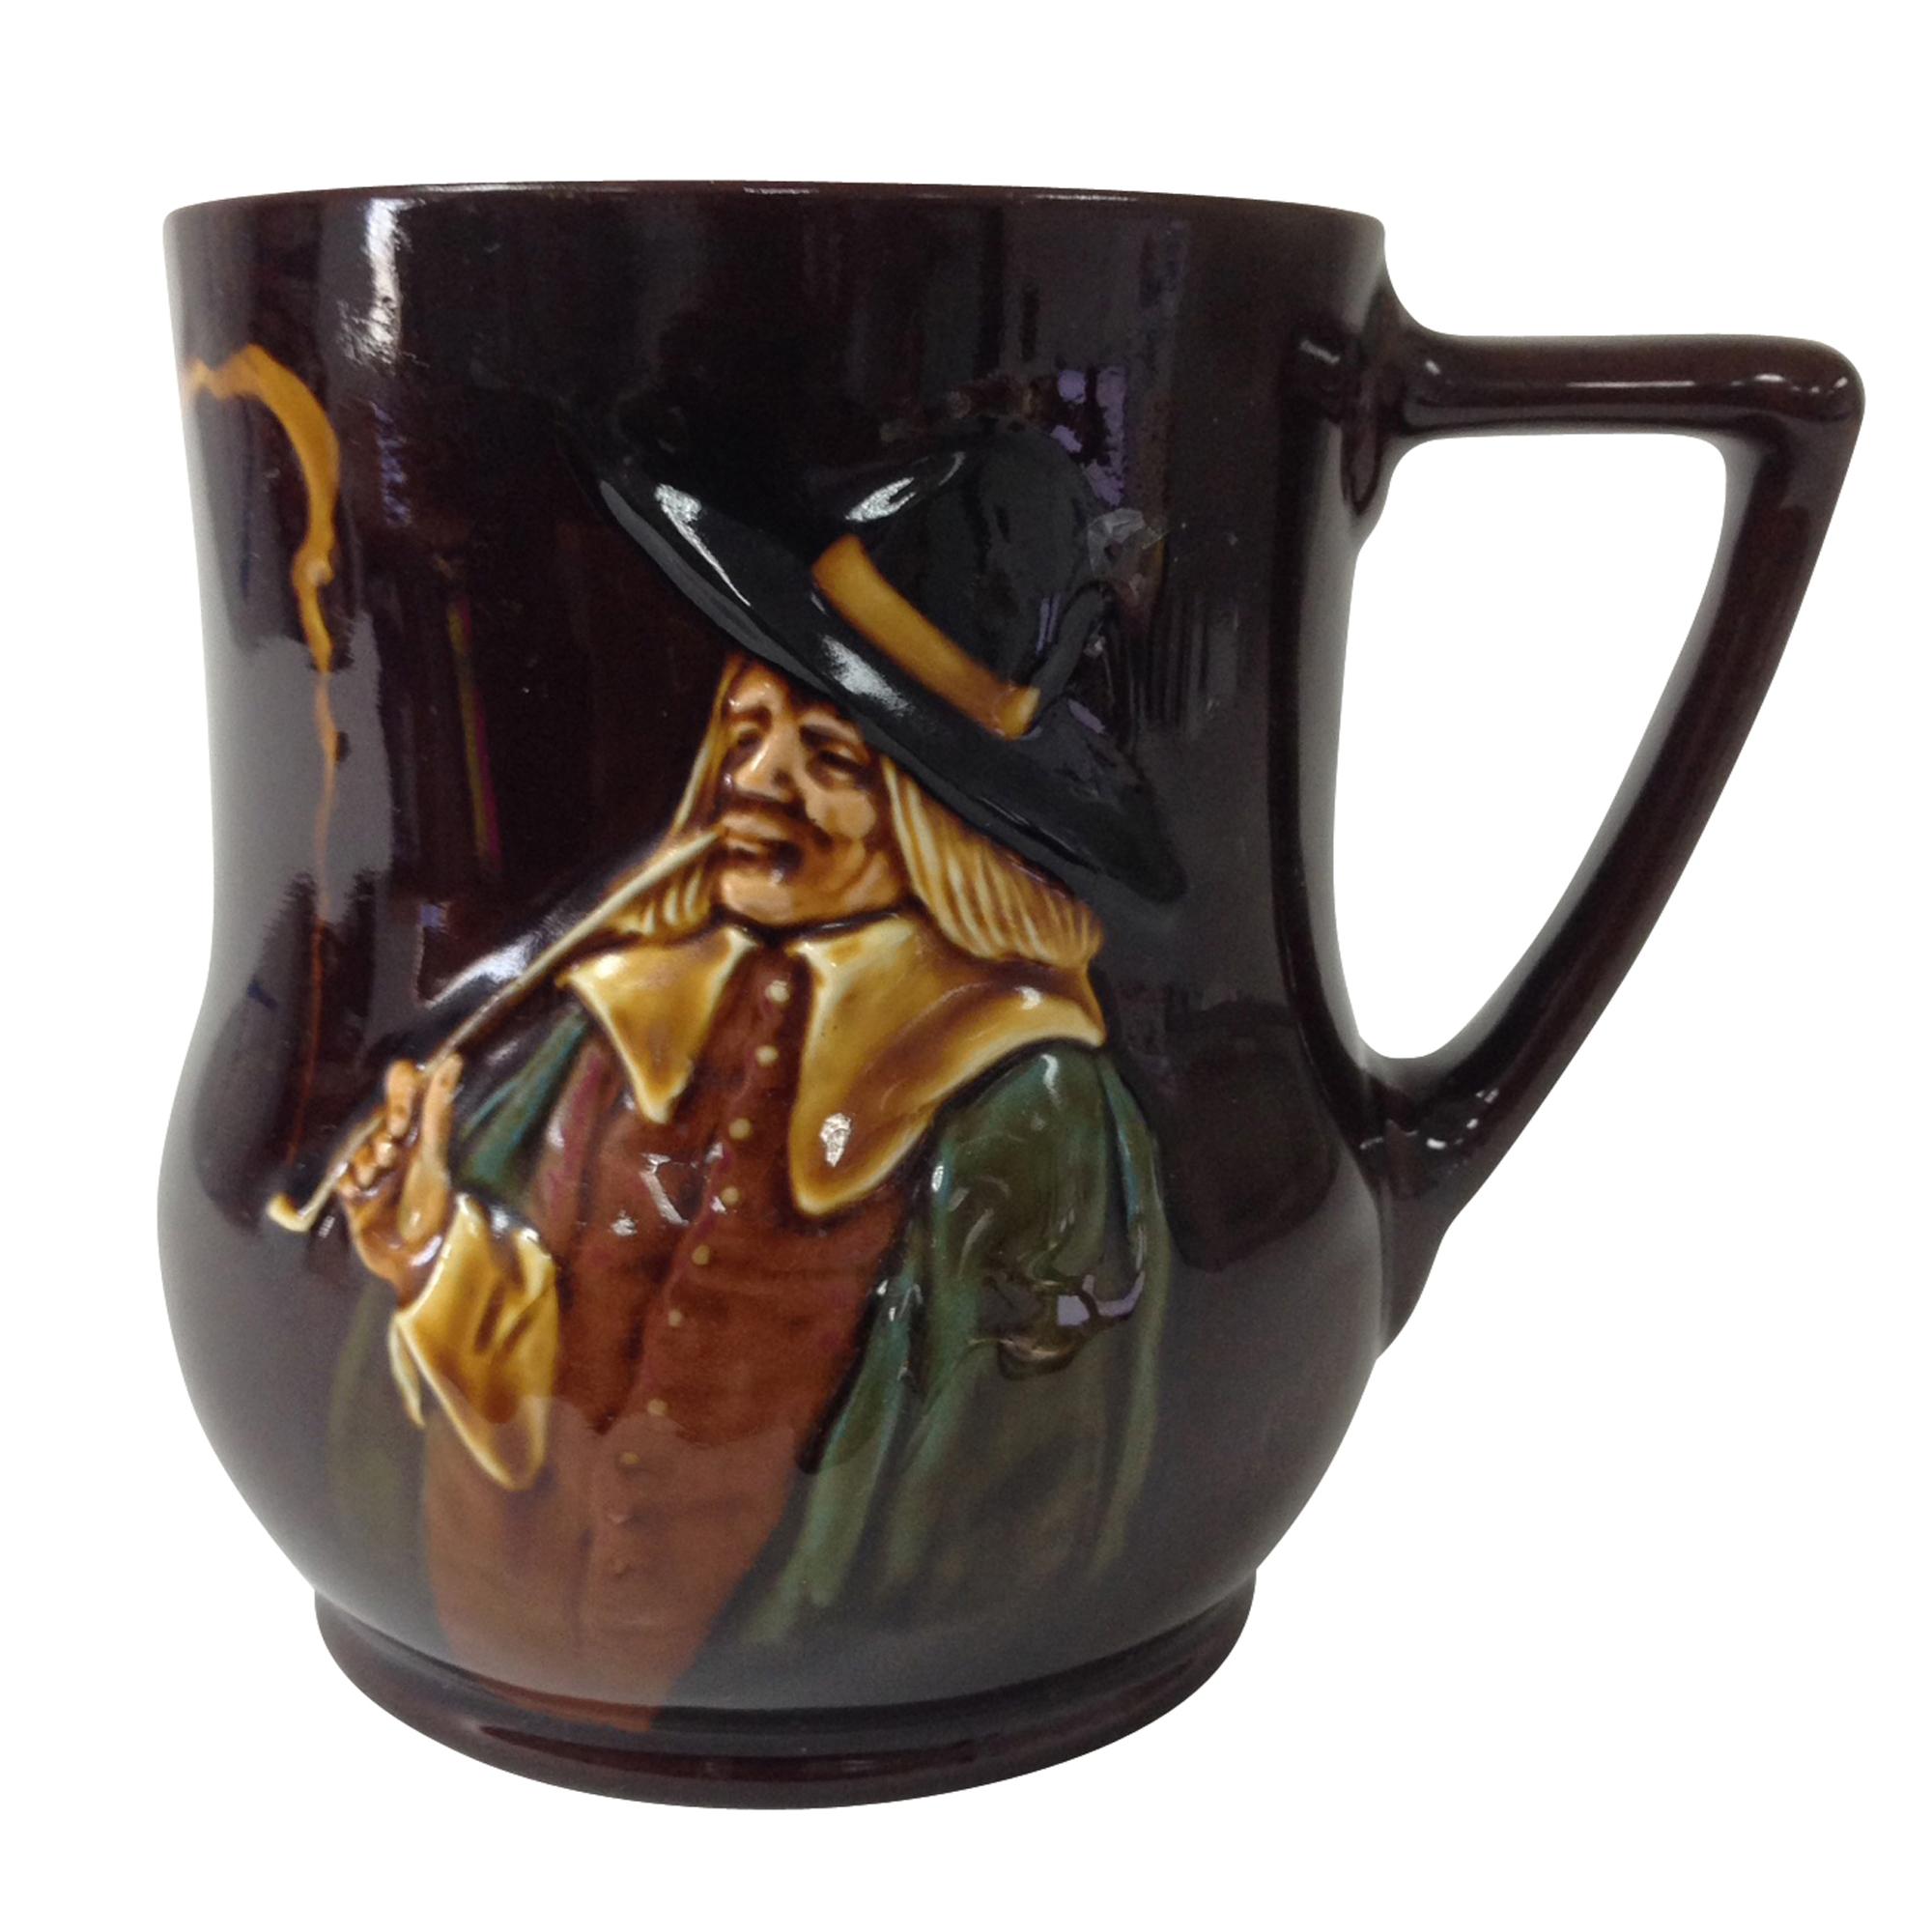 Kingsware Tankard 'The Smoker' - Royal Doulton Kingsware